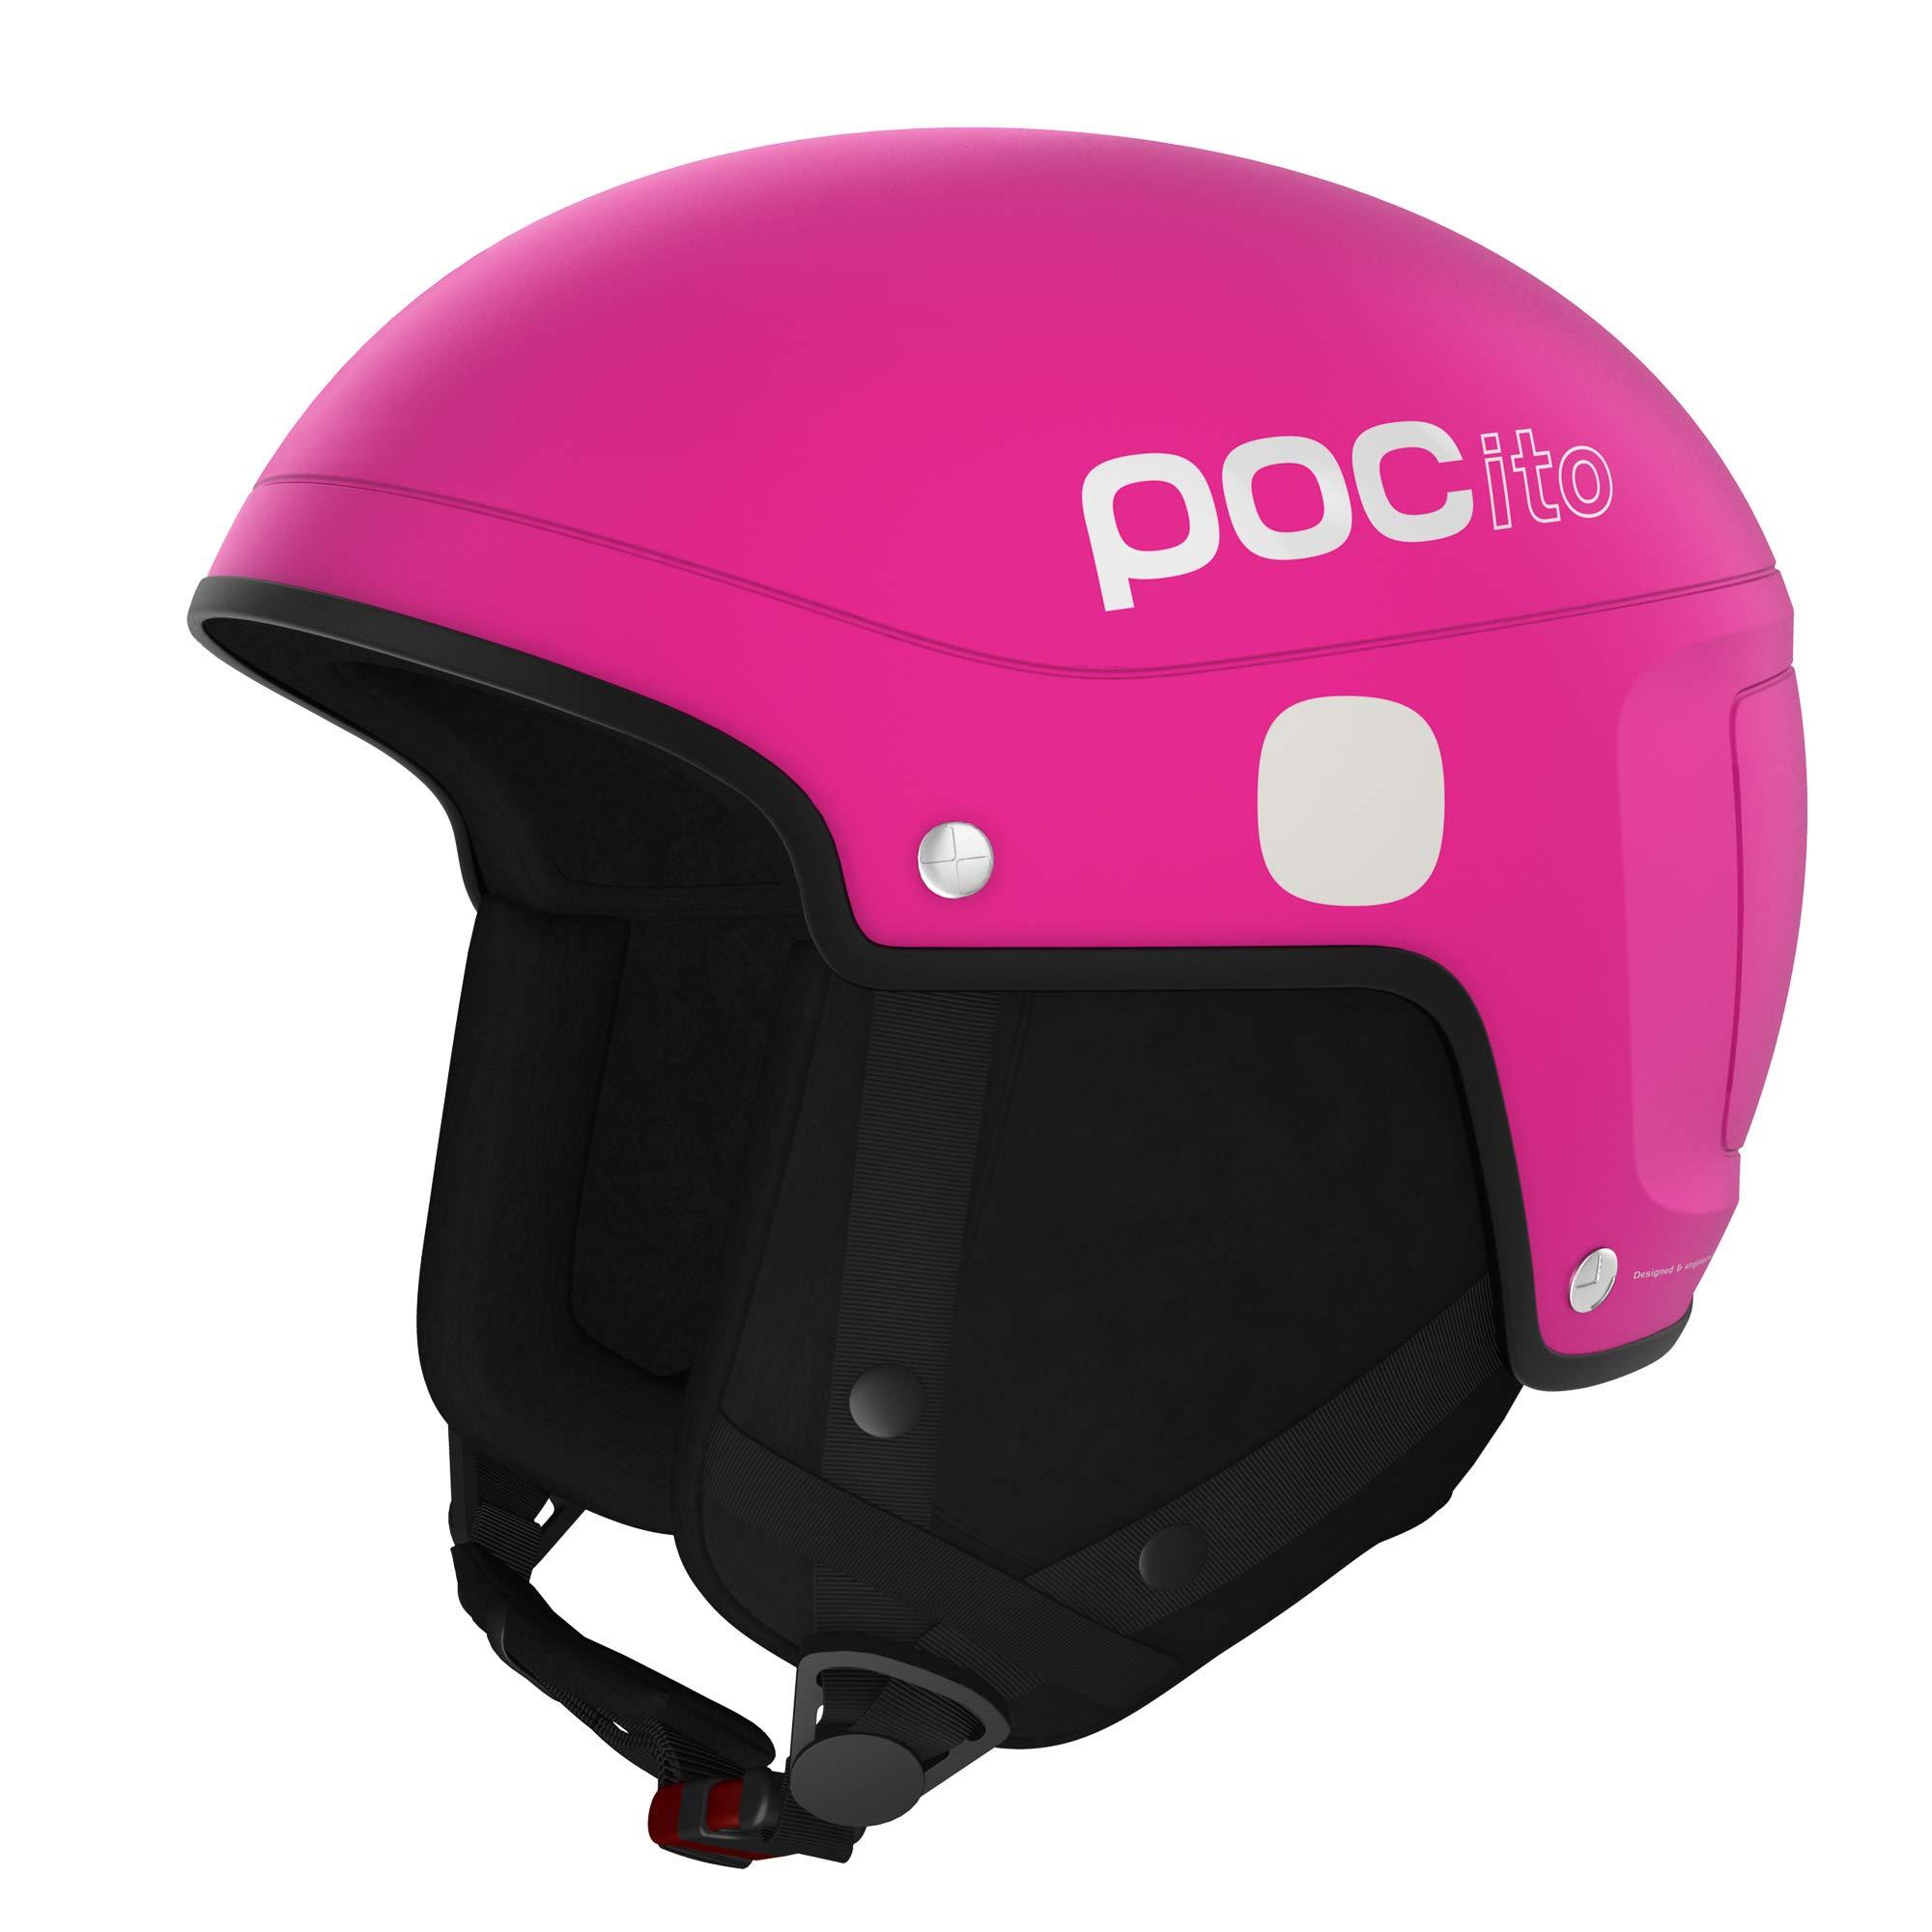 POC POCito Skull Light, Children's Helmet, Fluorescent Pink, XS/S